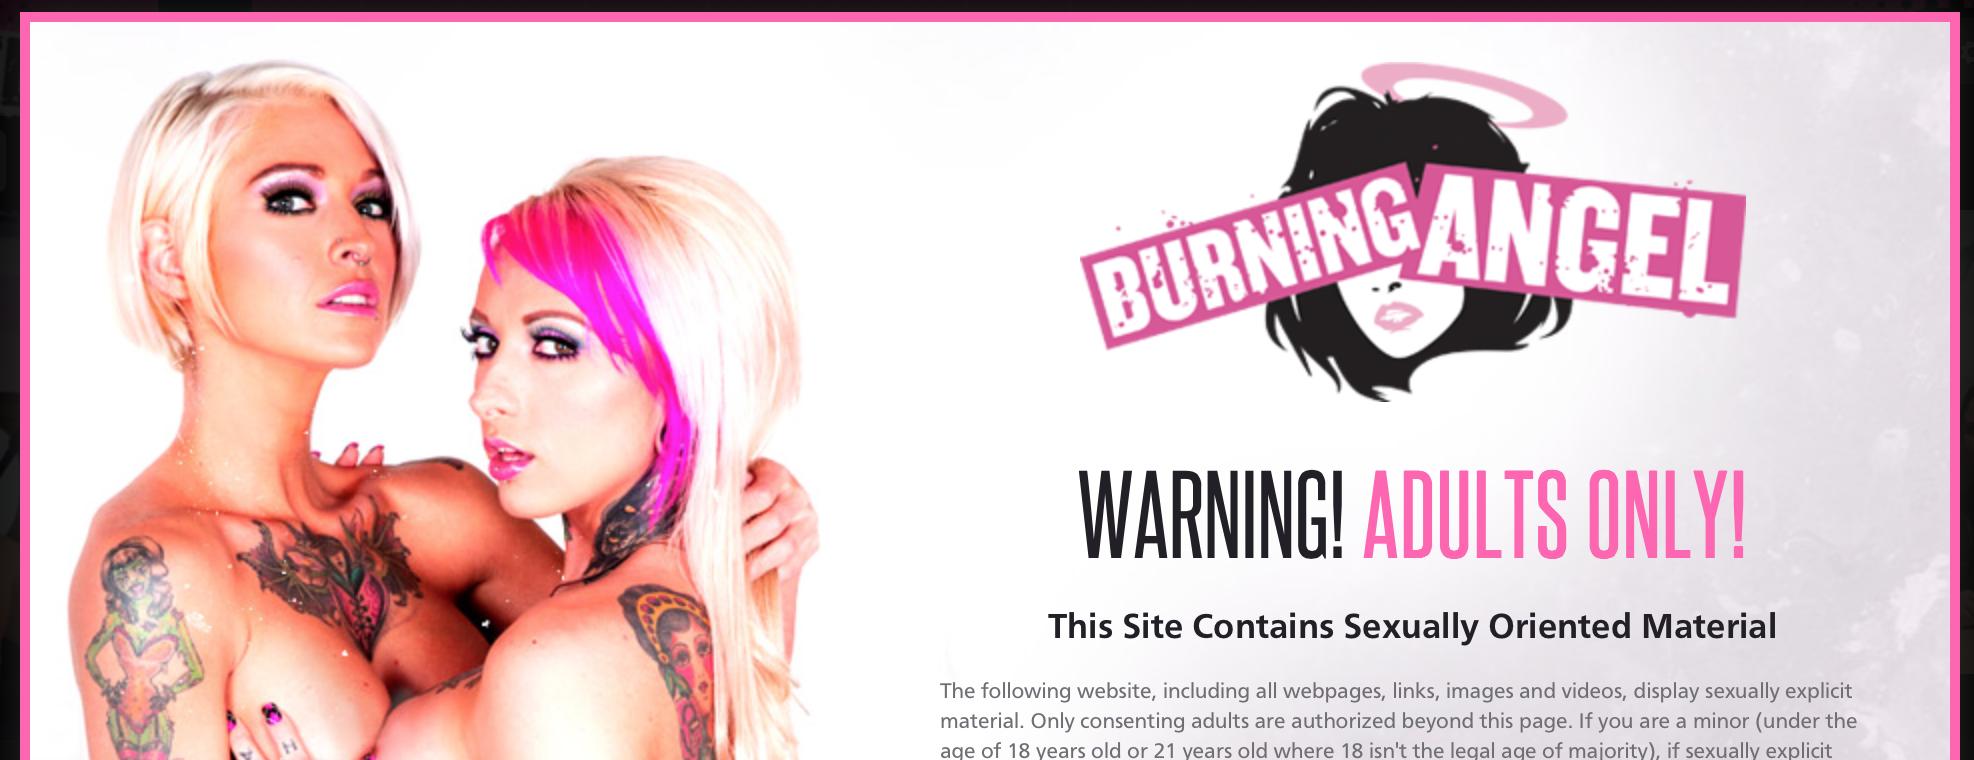 BurningAngel.com